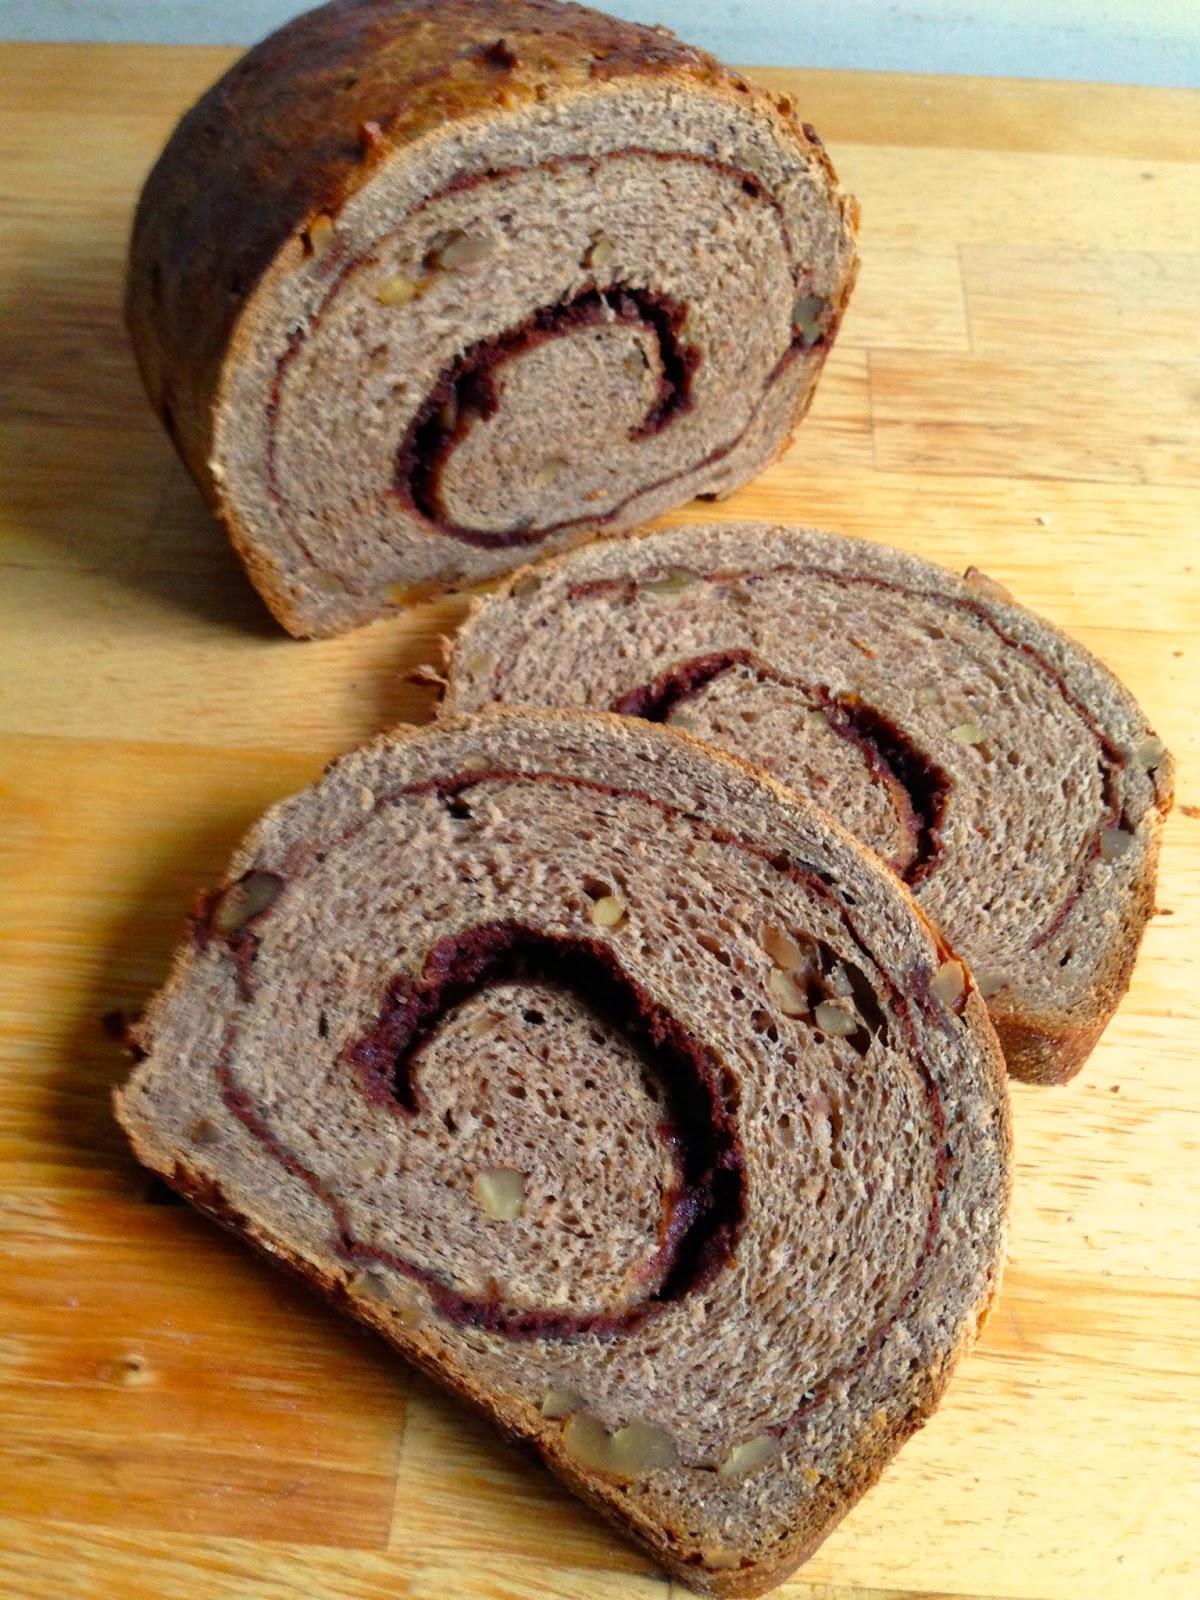 Brot & Bread: 100% WHOLE WHEAT CINNAMON SWIRL BREAD